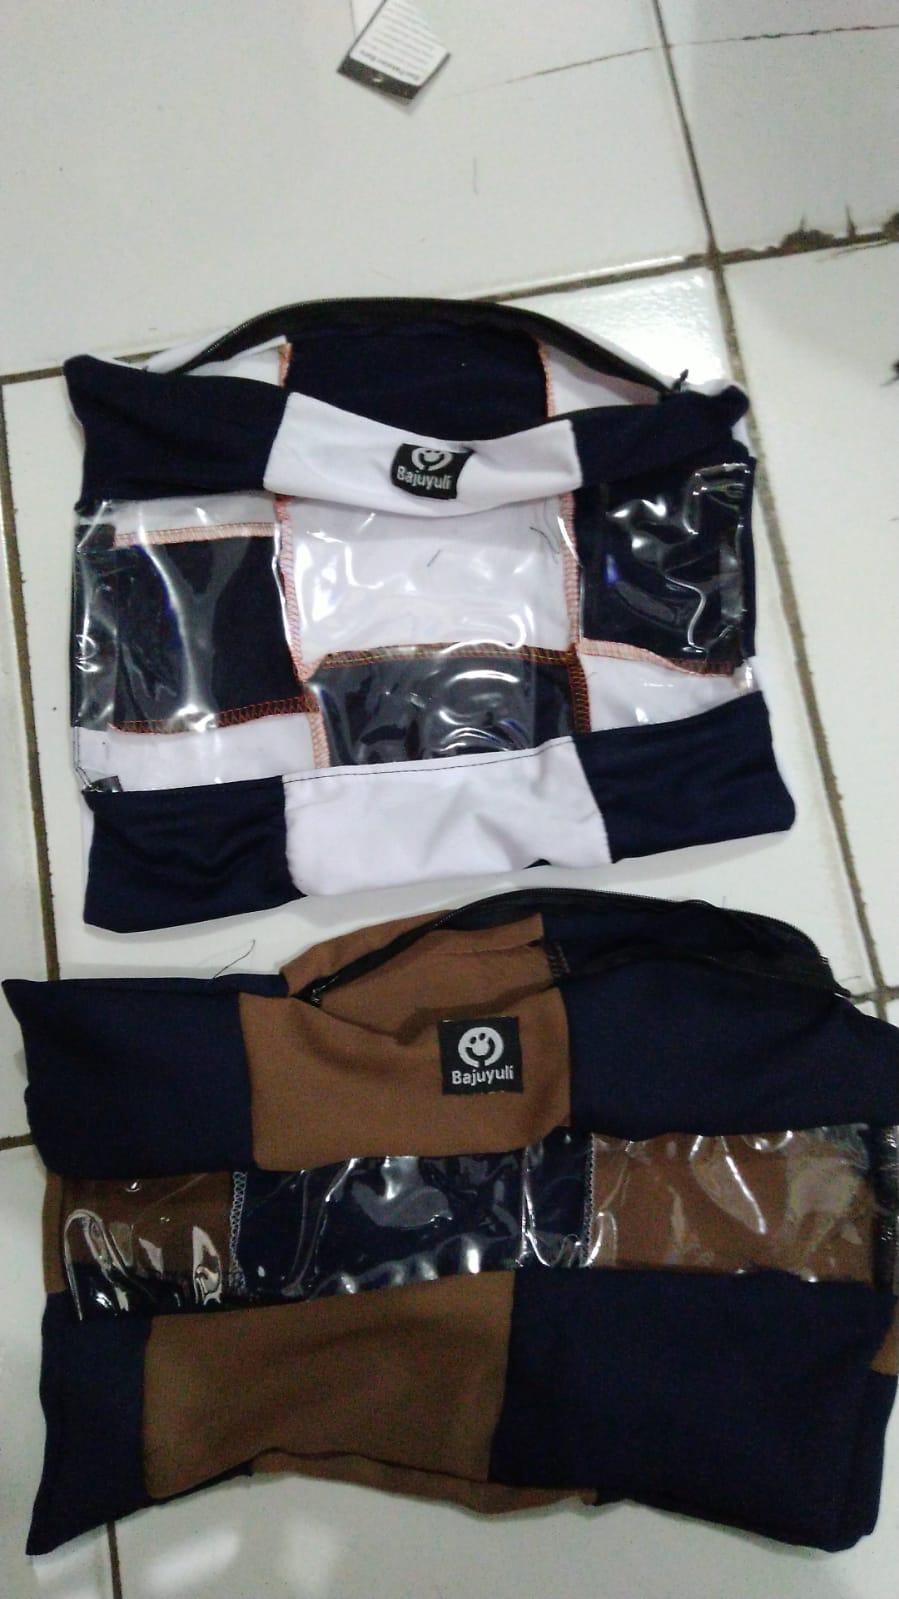 tas packing dari kain limbah, pengganti plastik